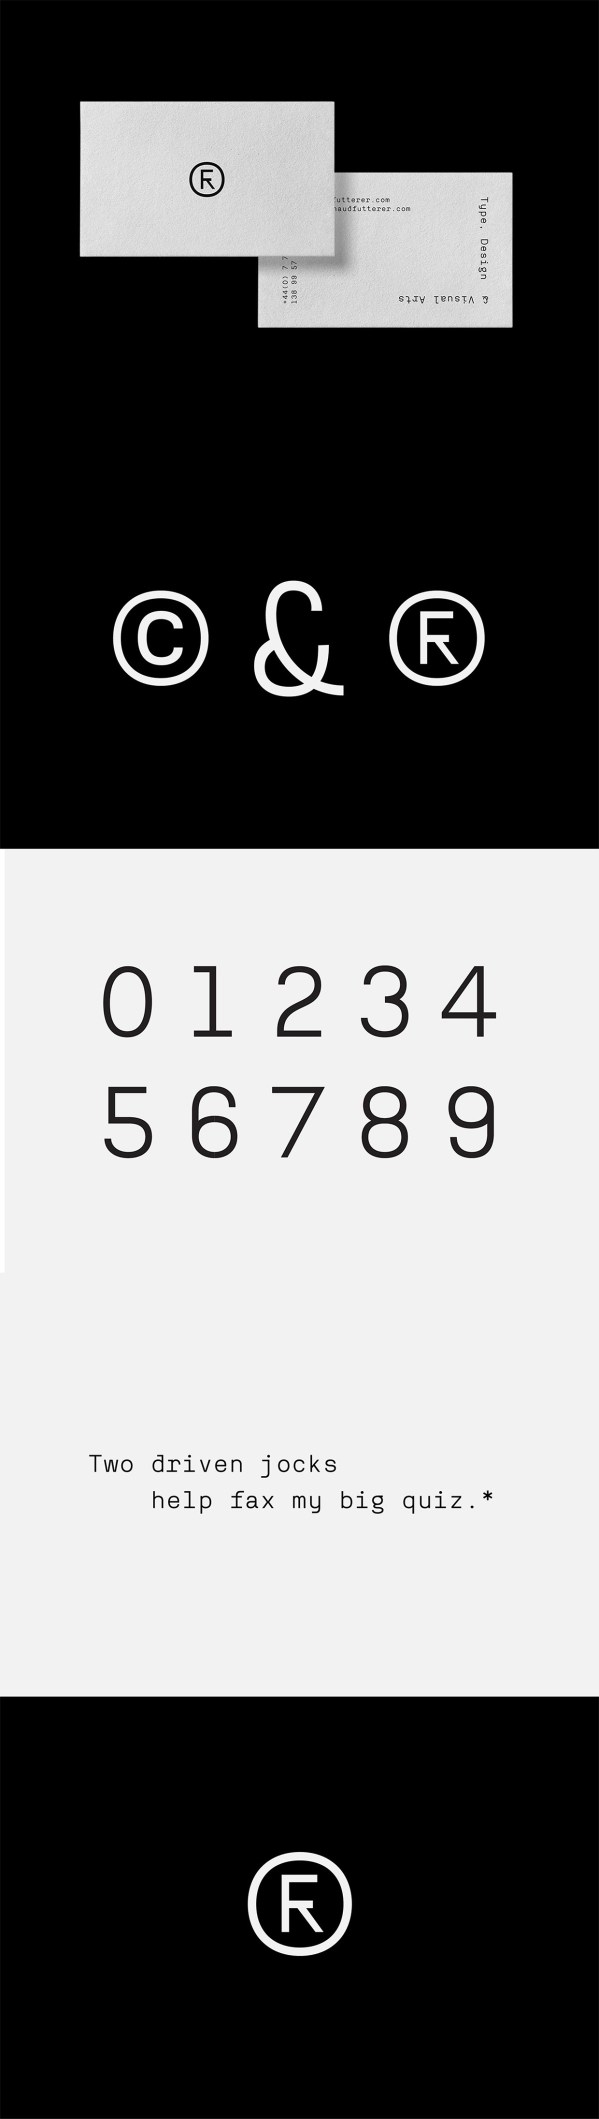 RenoMono Free Font